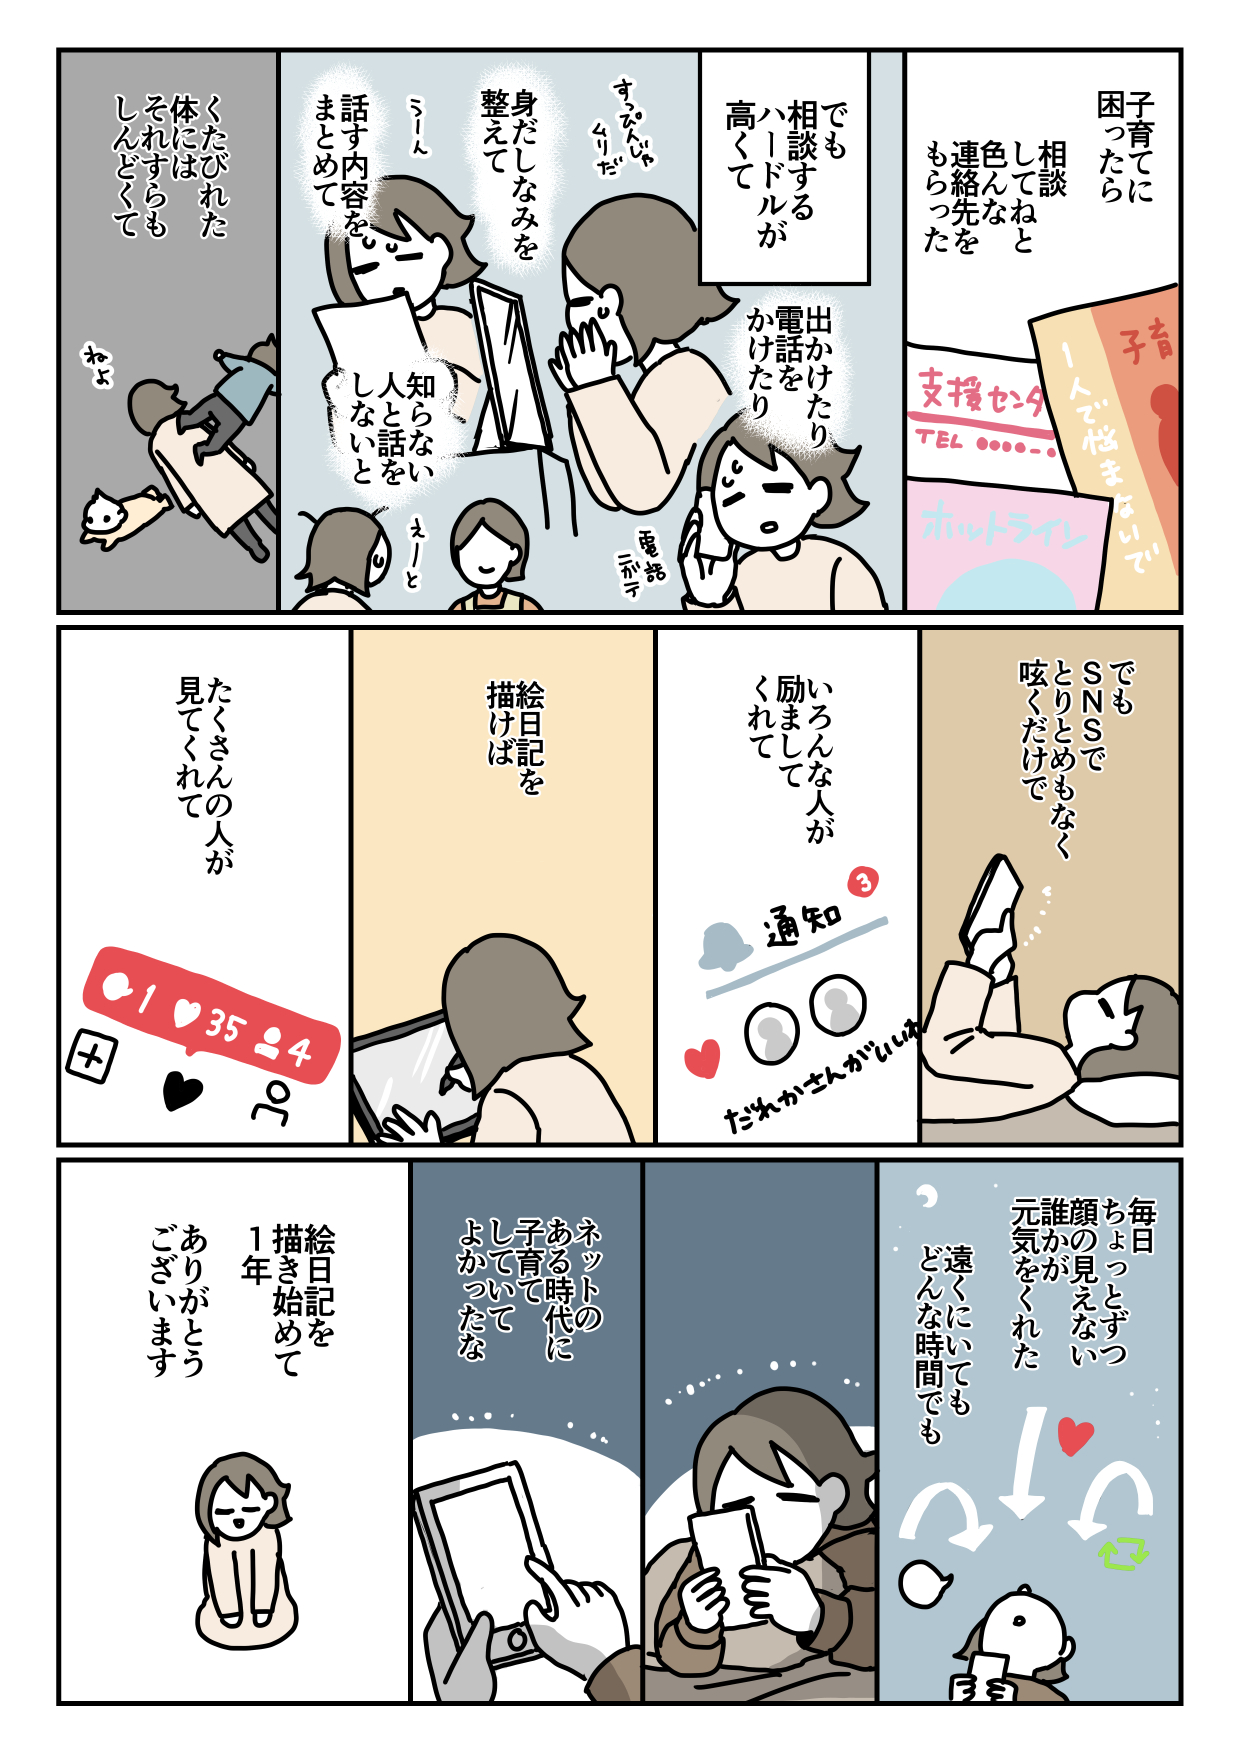 f:id:kanemotonomukuu:20171010201119j:plain